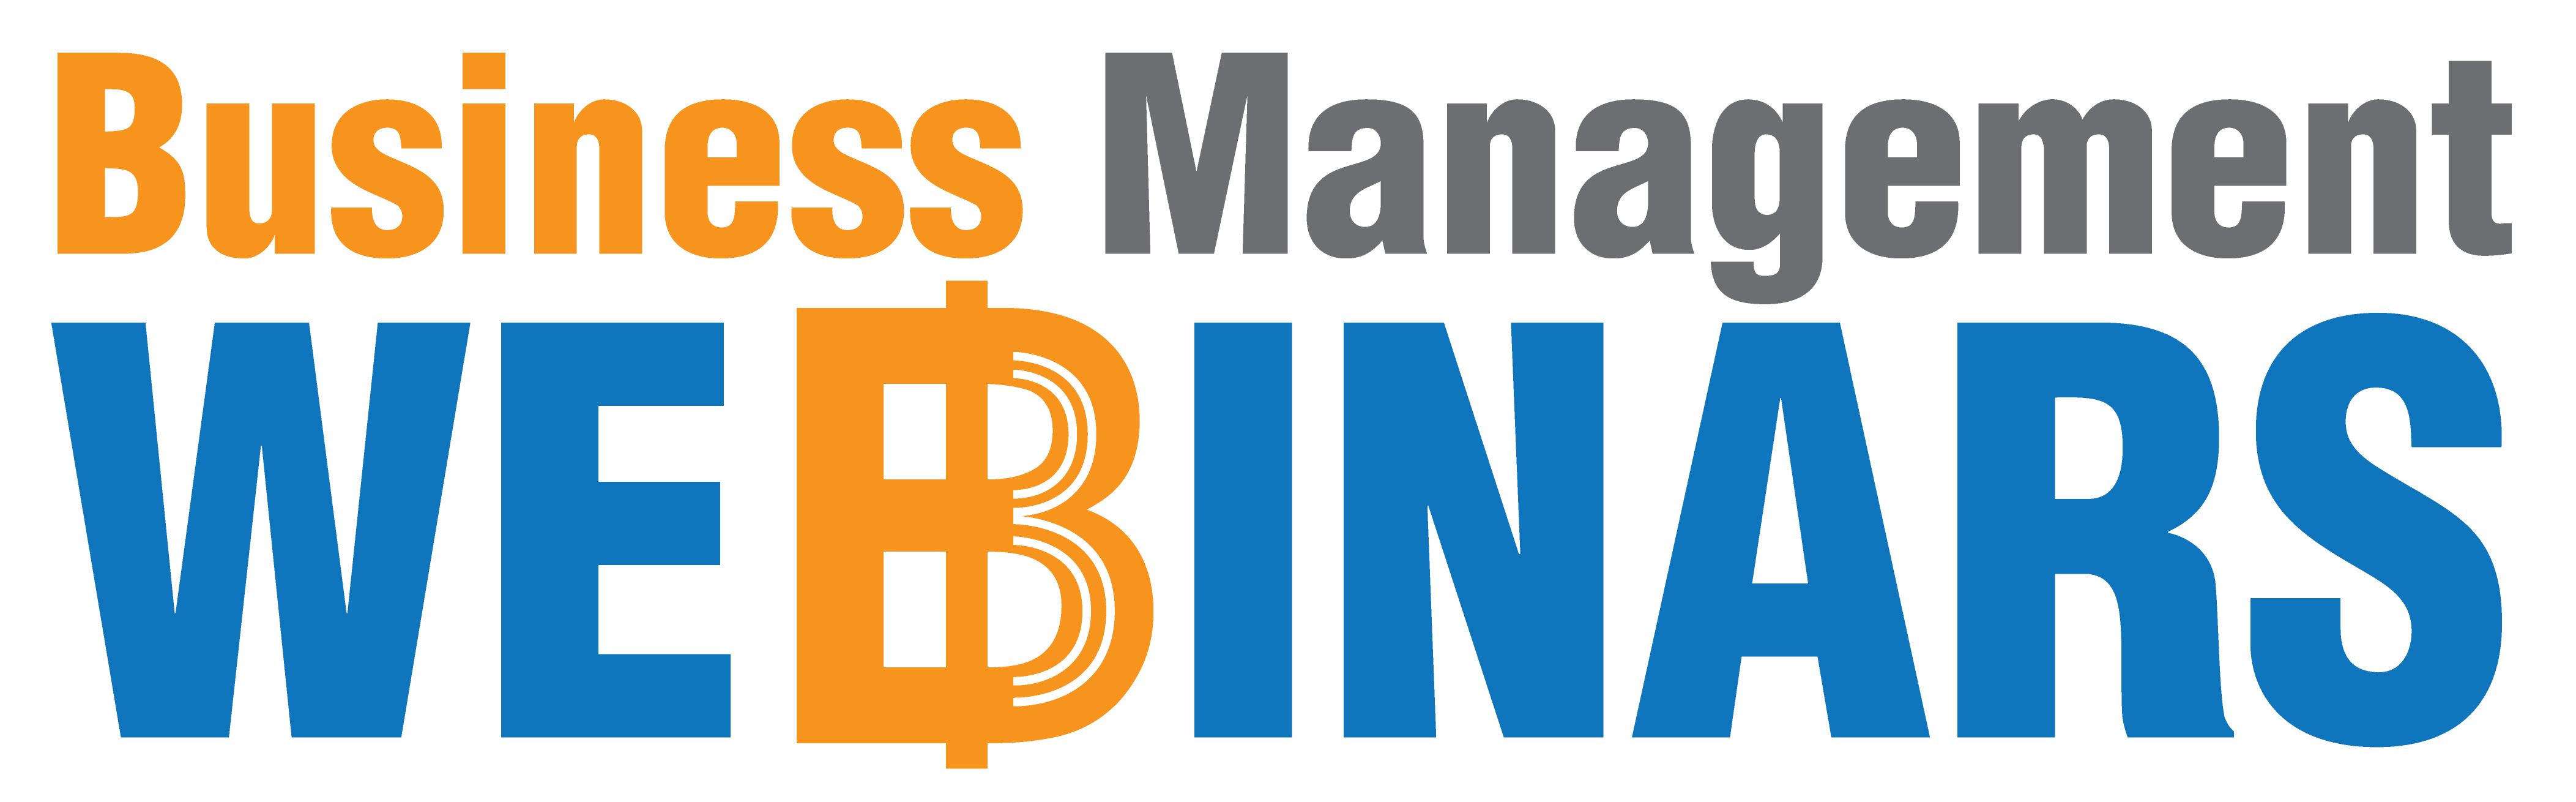 Business_Management_Webinars